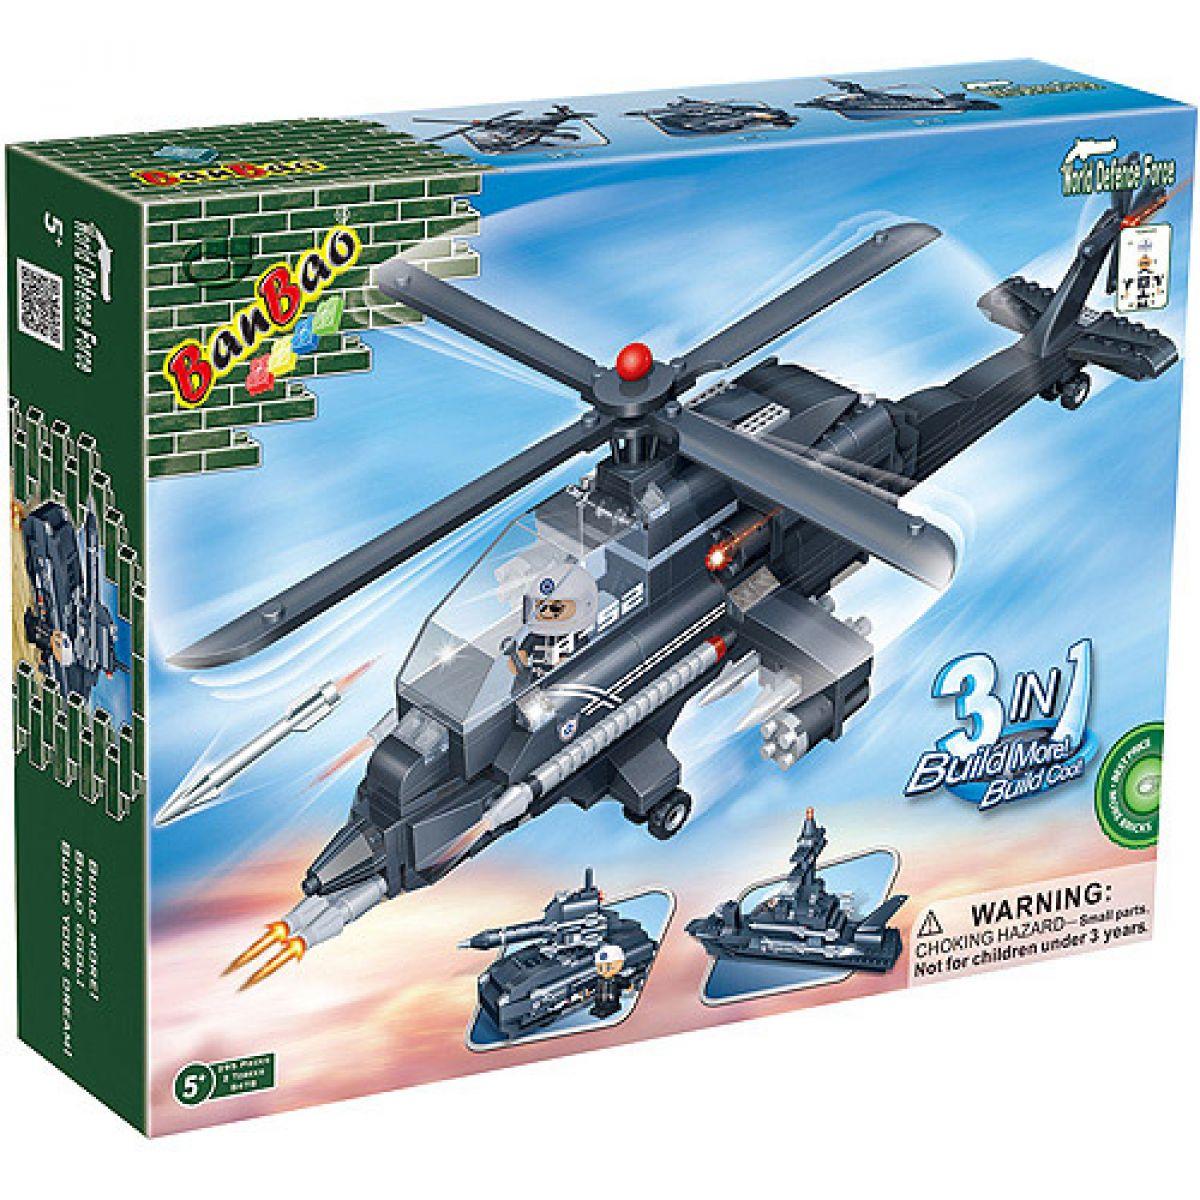 Banbao Armáda 8478 Vrtulník Loď Raketomet 3 v 1